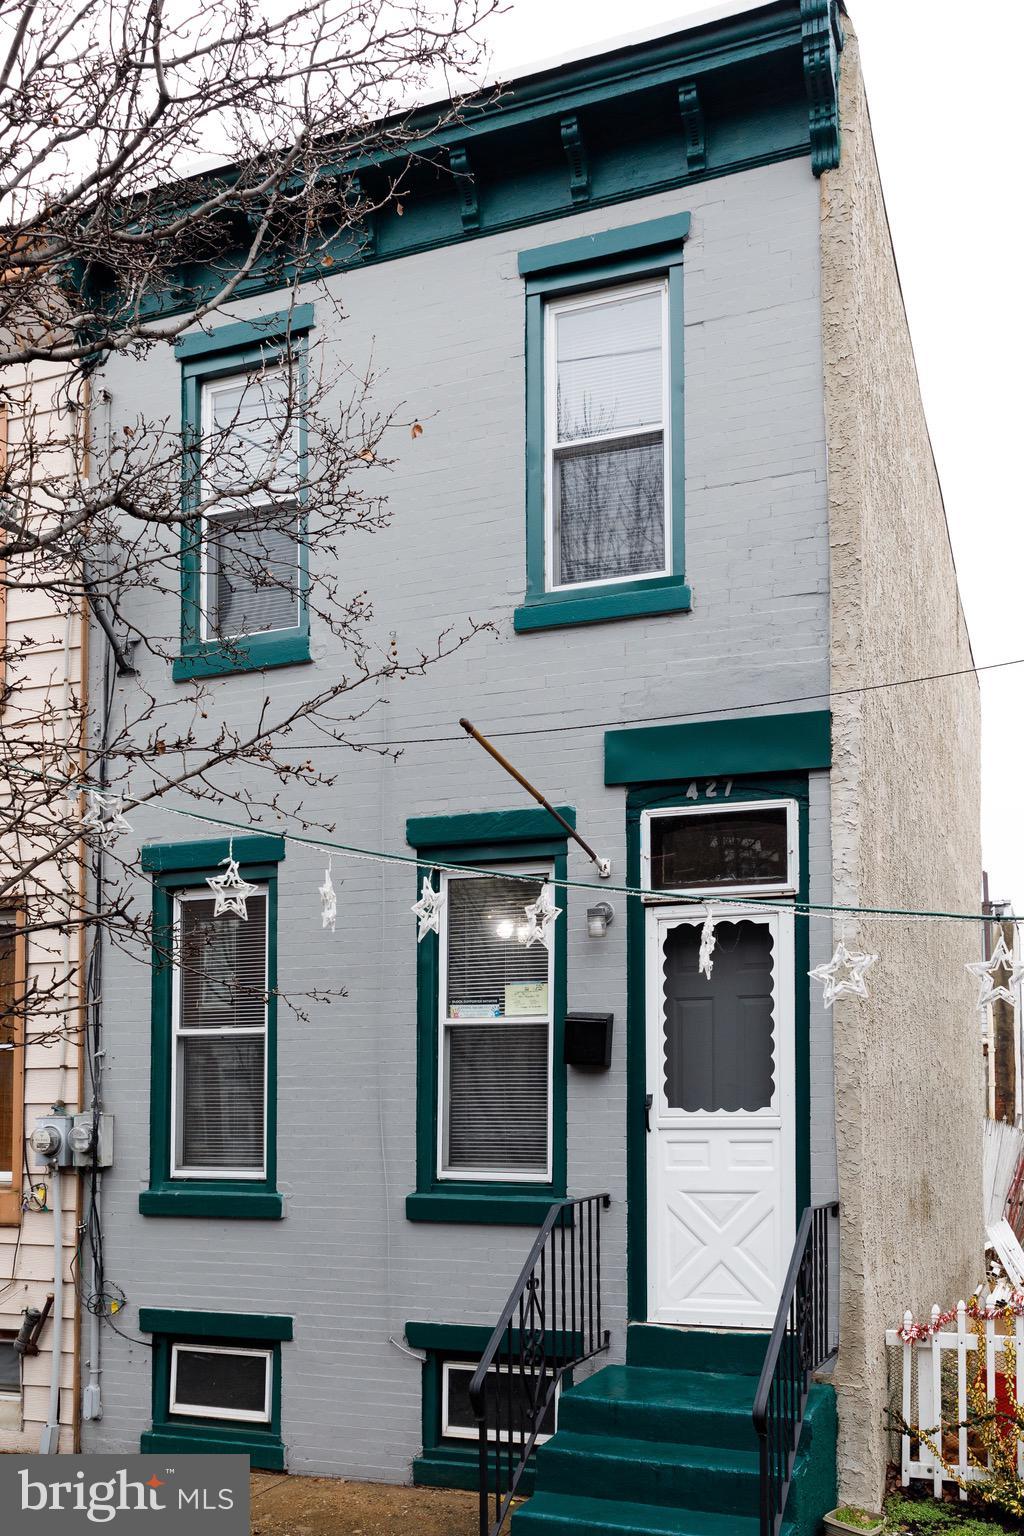 427 ROYDEN STREET, CAMDEN, NJ 08103